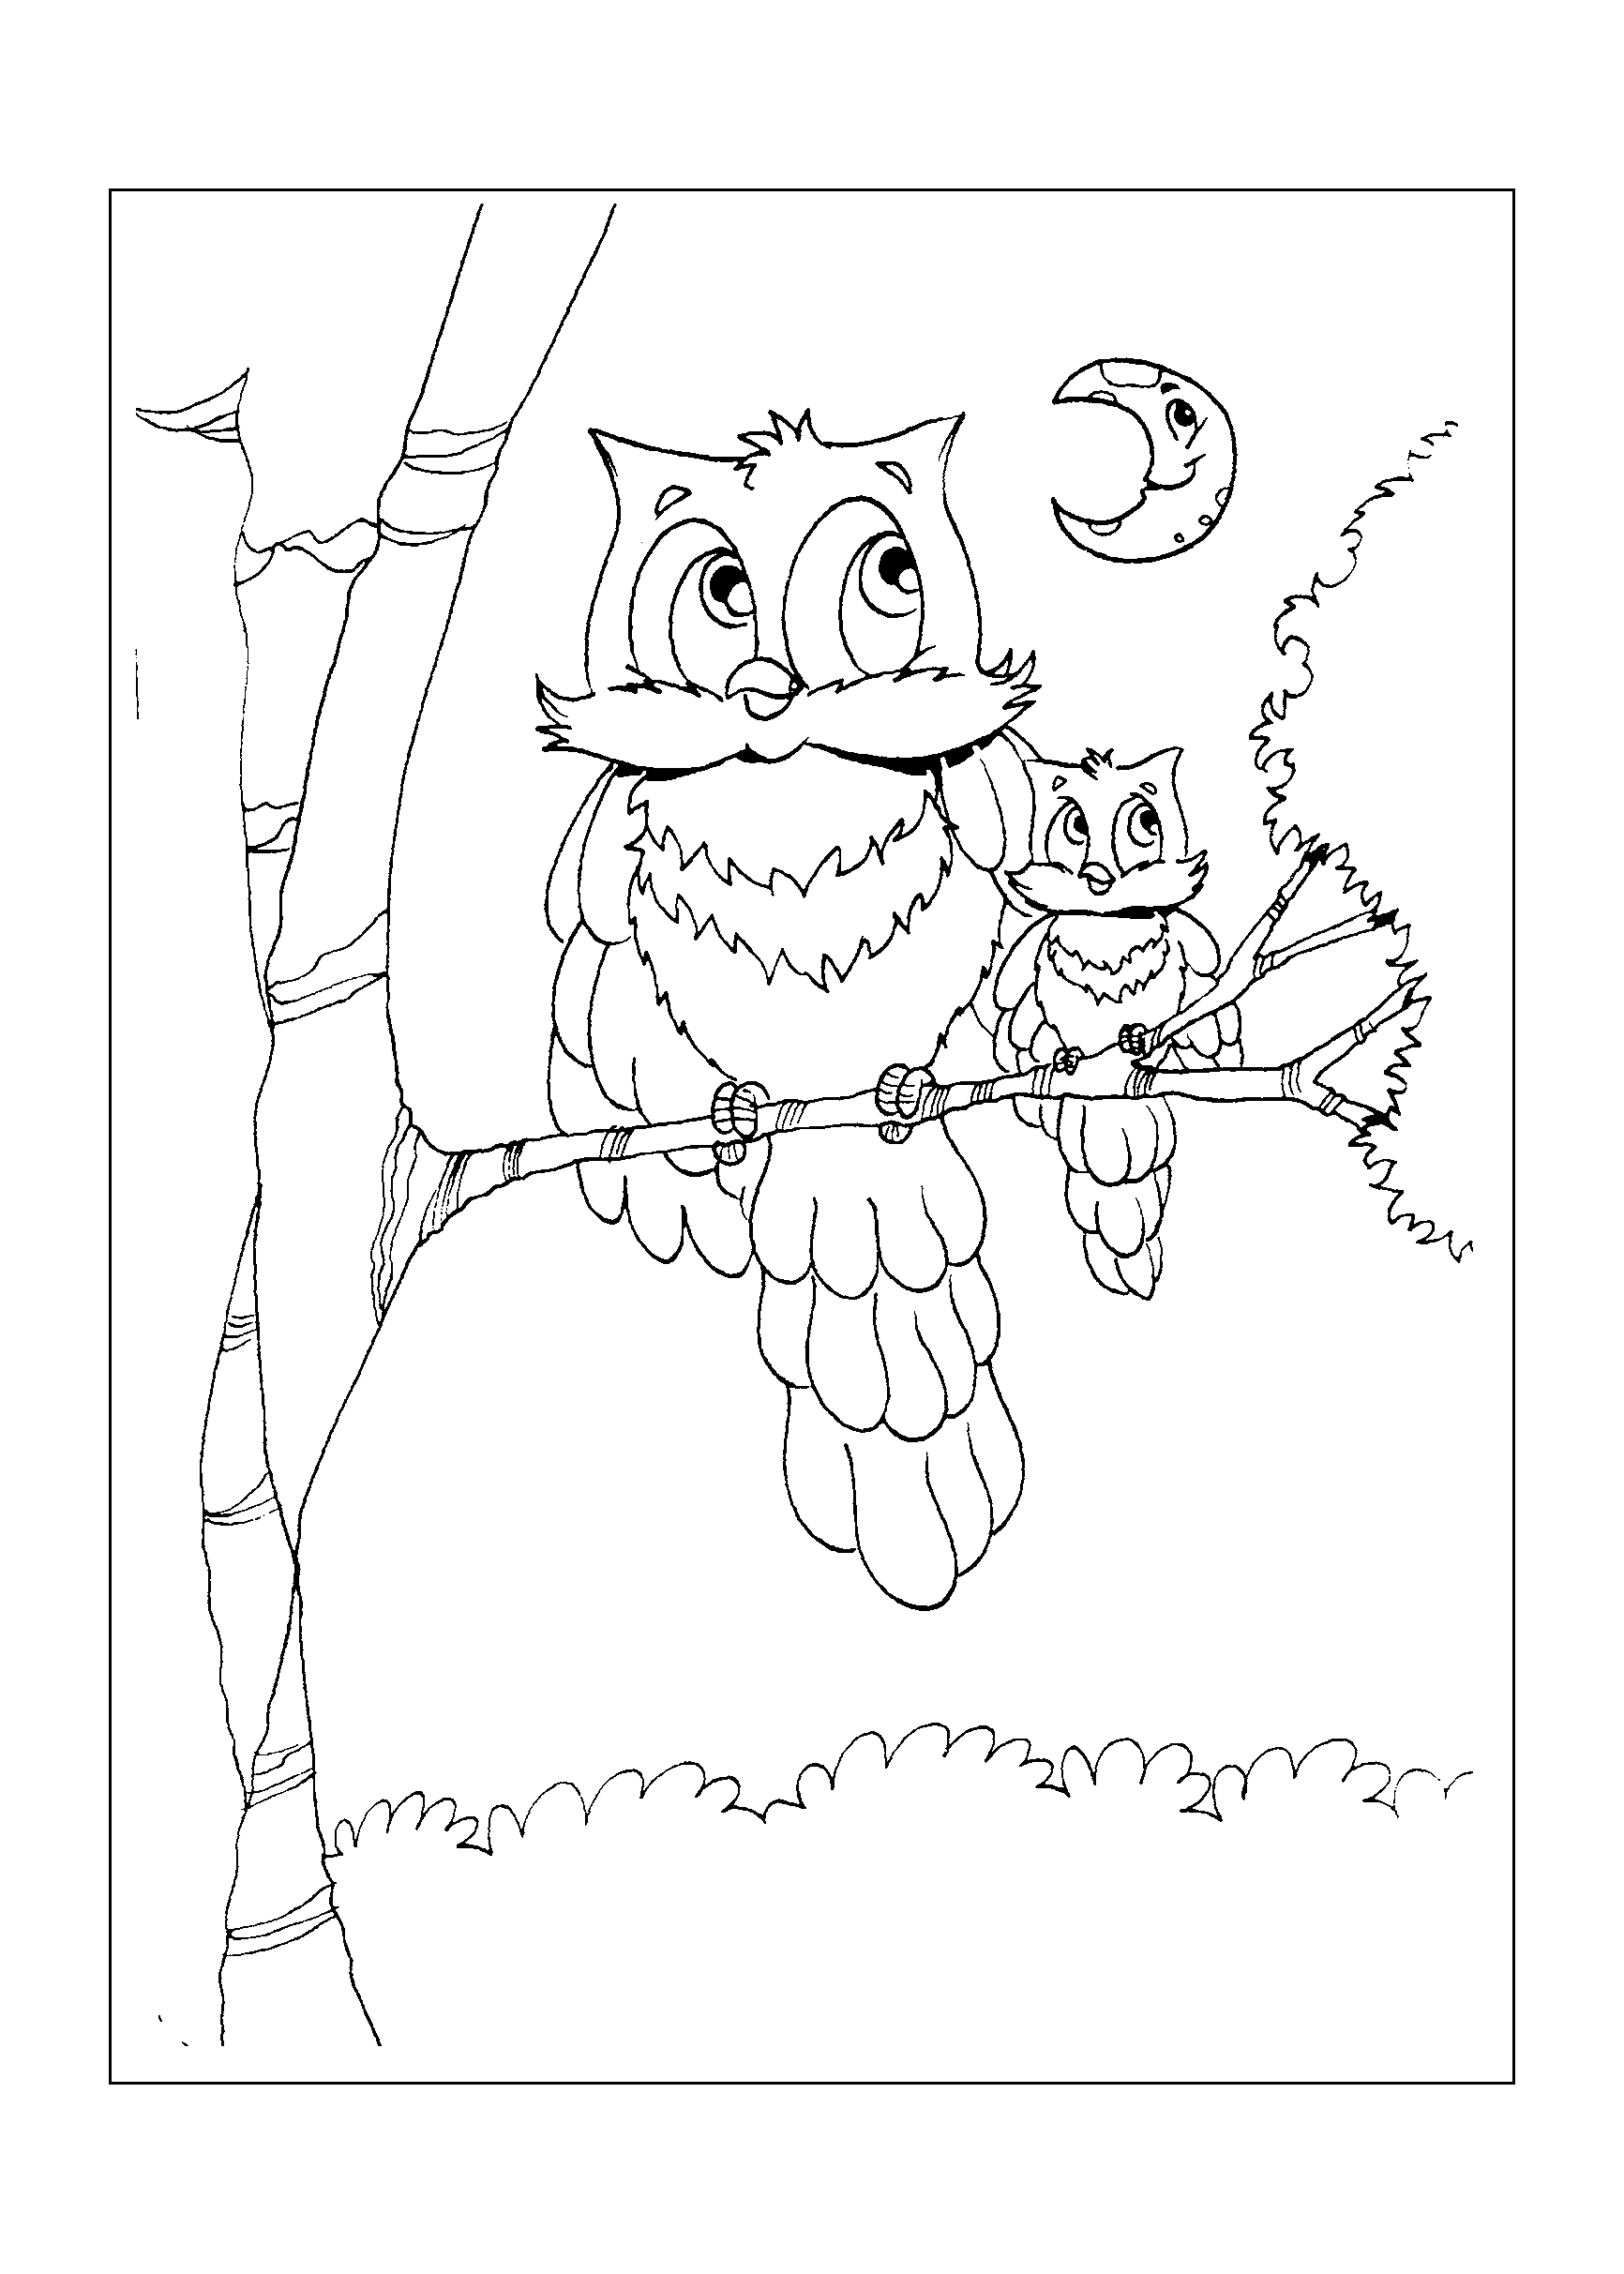 0166-desenho-colorir-coruja